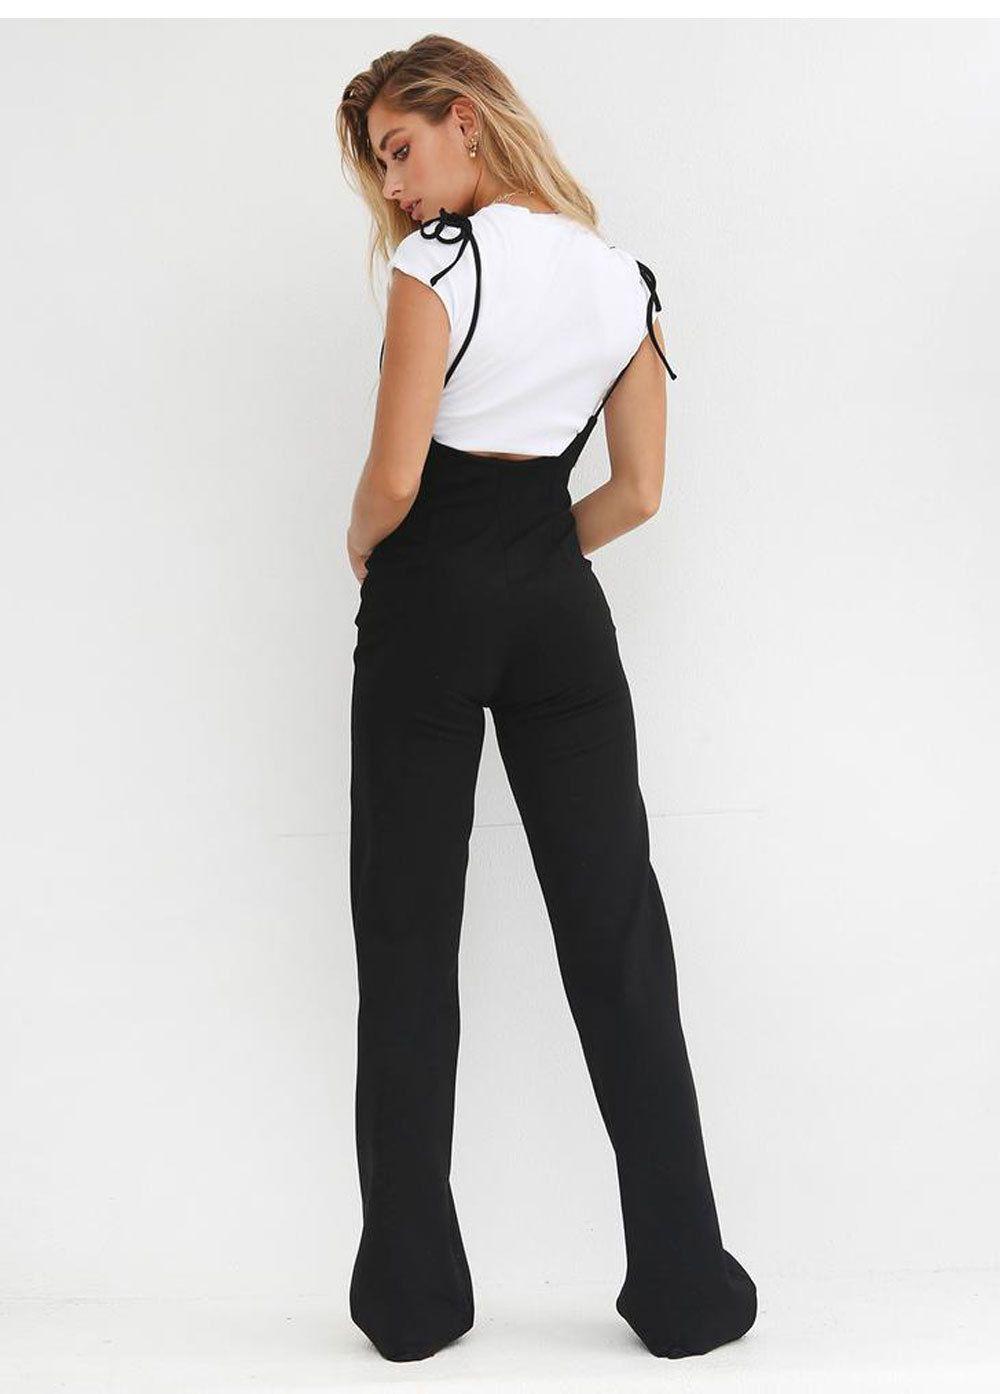 Fanny - Fanny Fashion Womens Black Lace Top Full Length